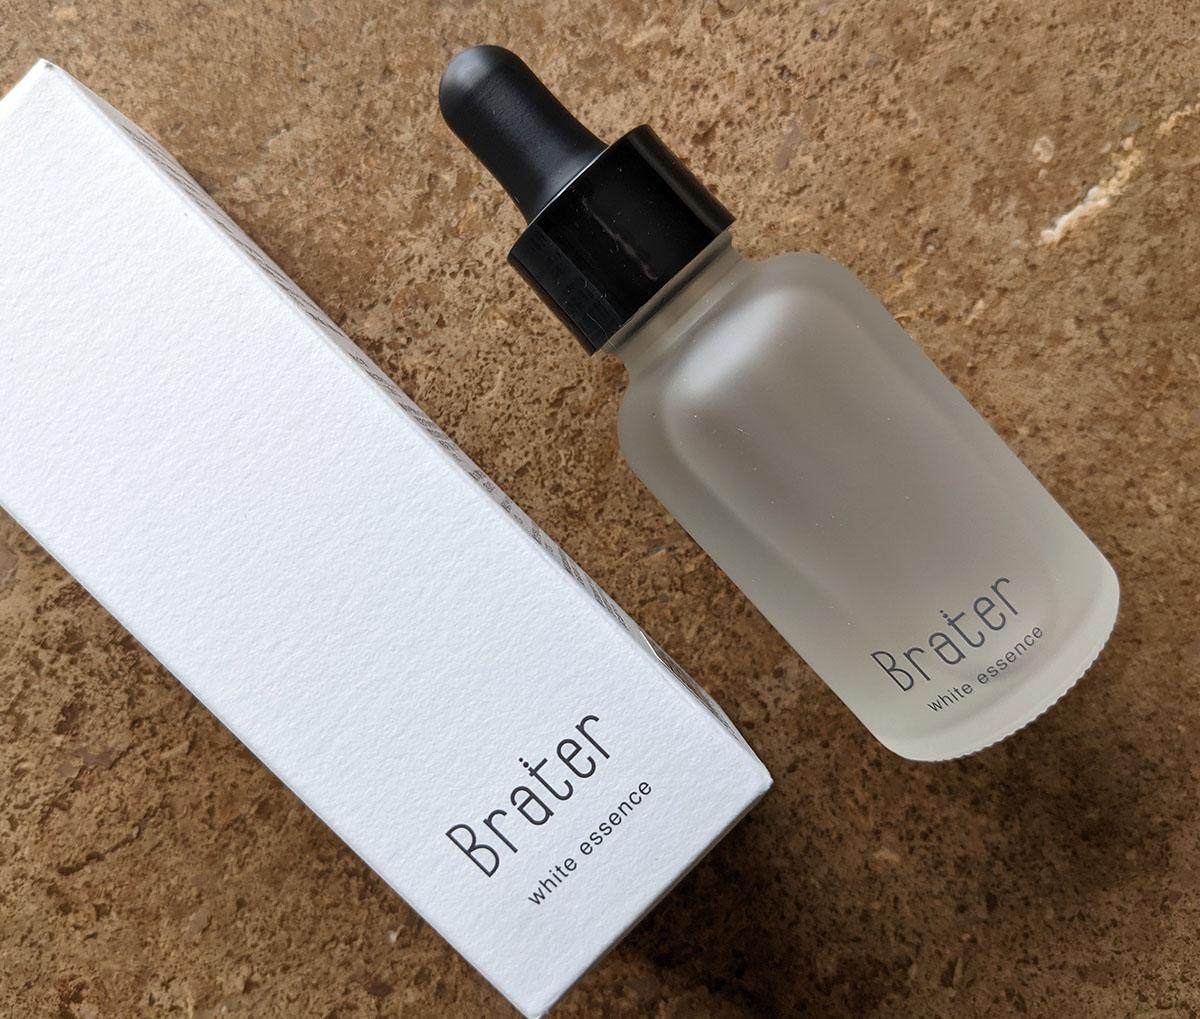 Brater薬用美白美容液